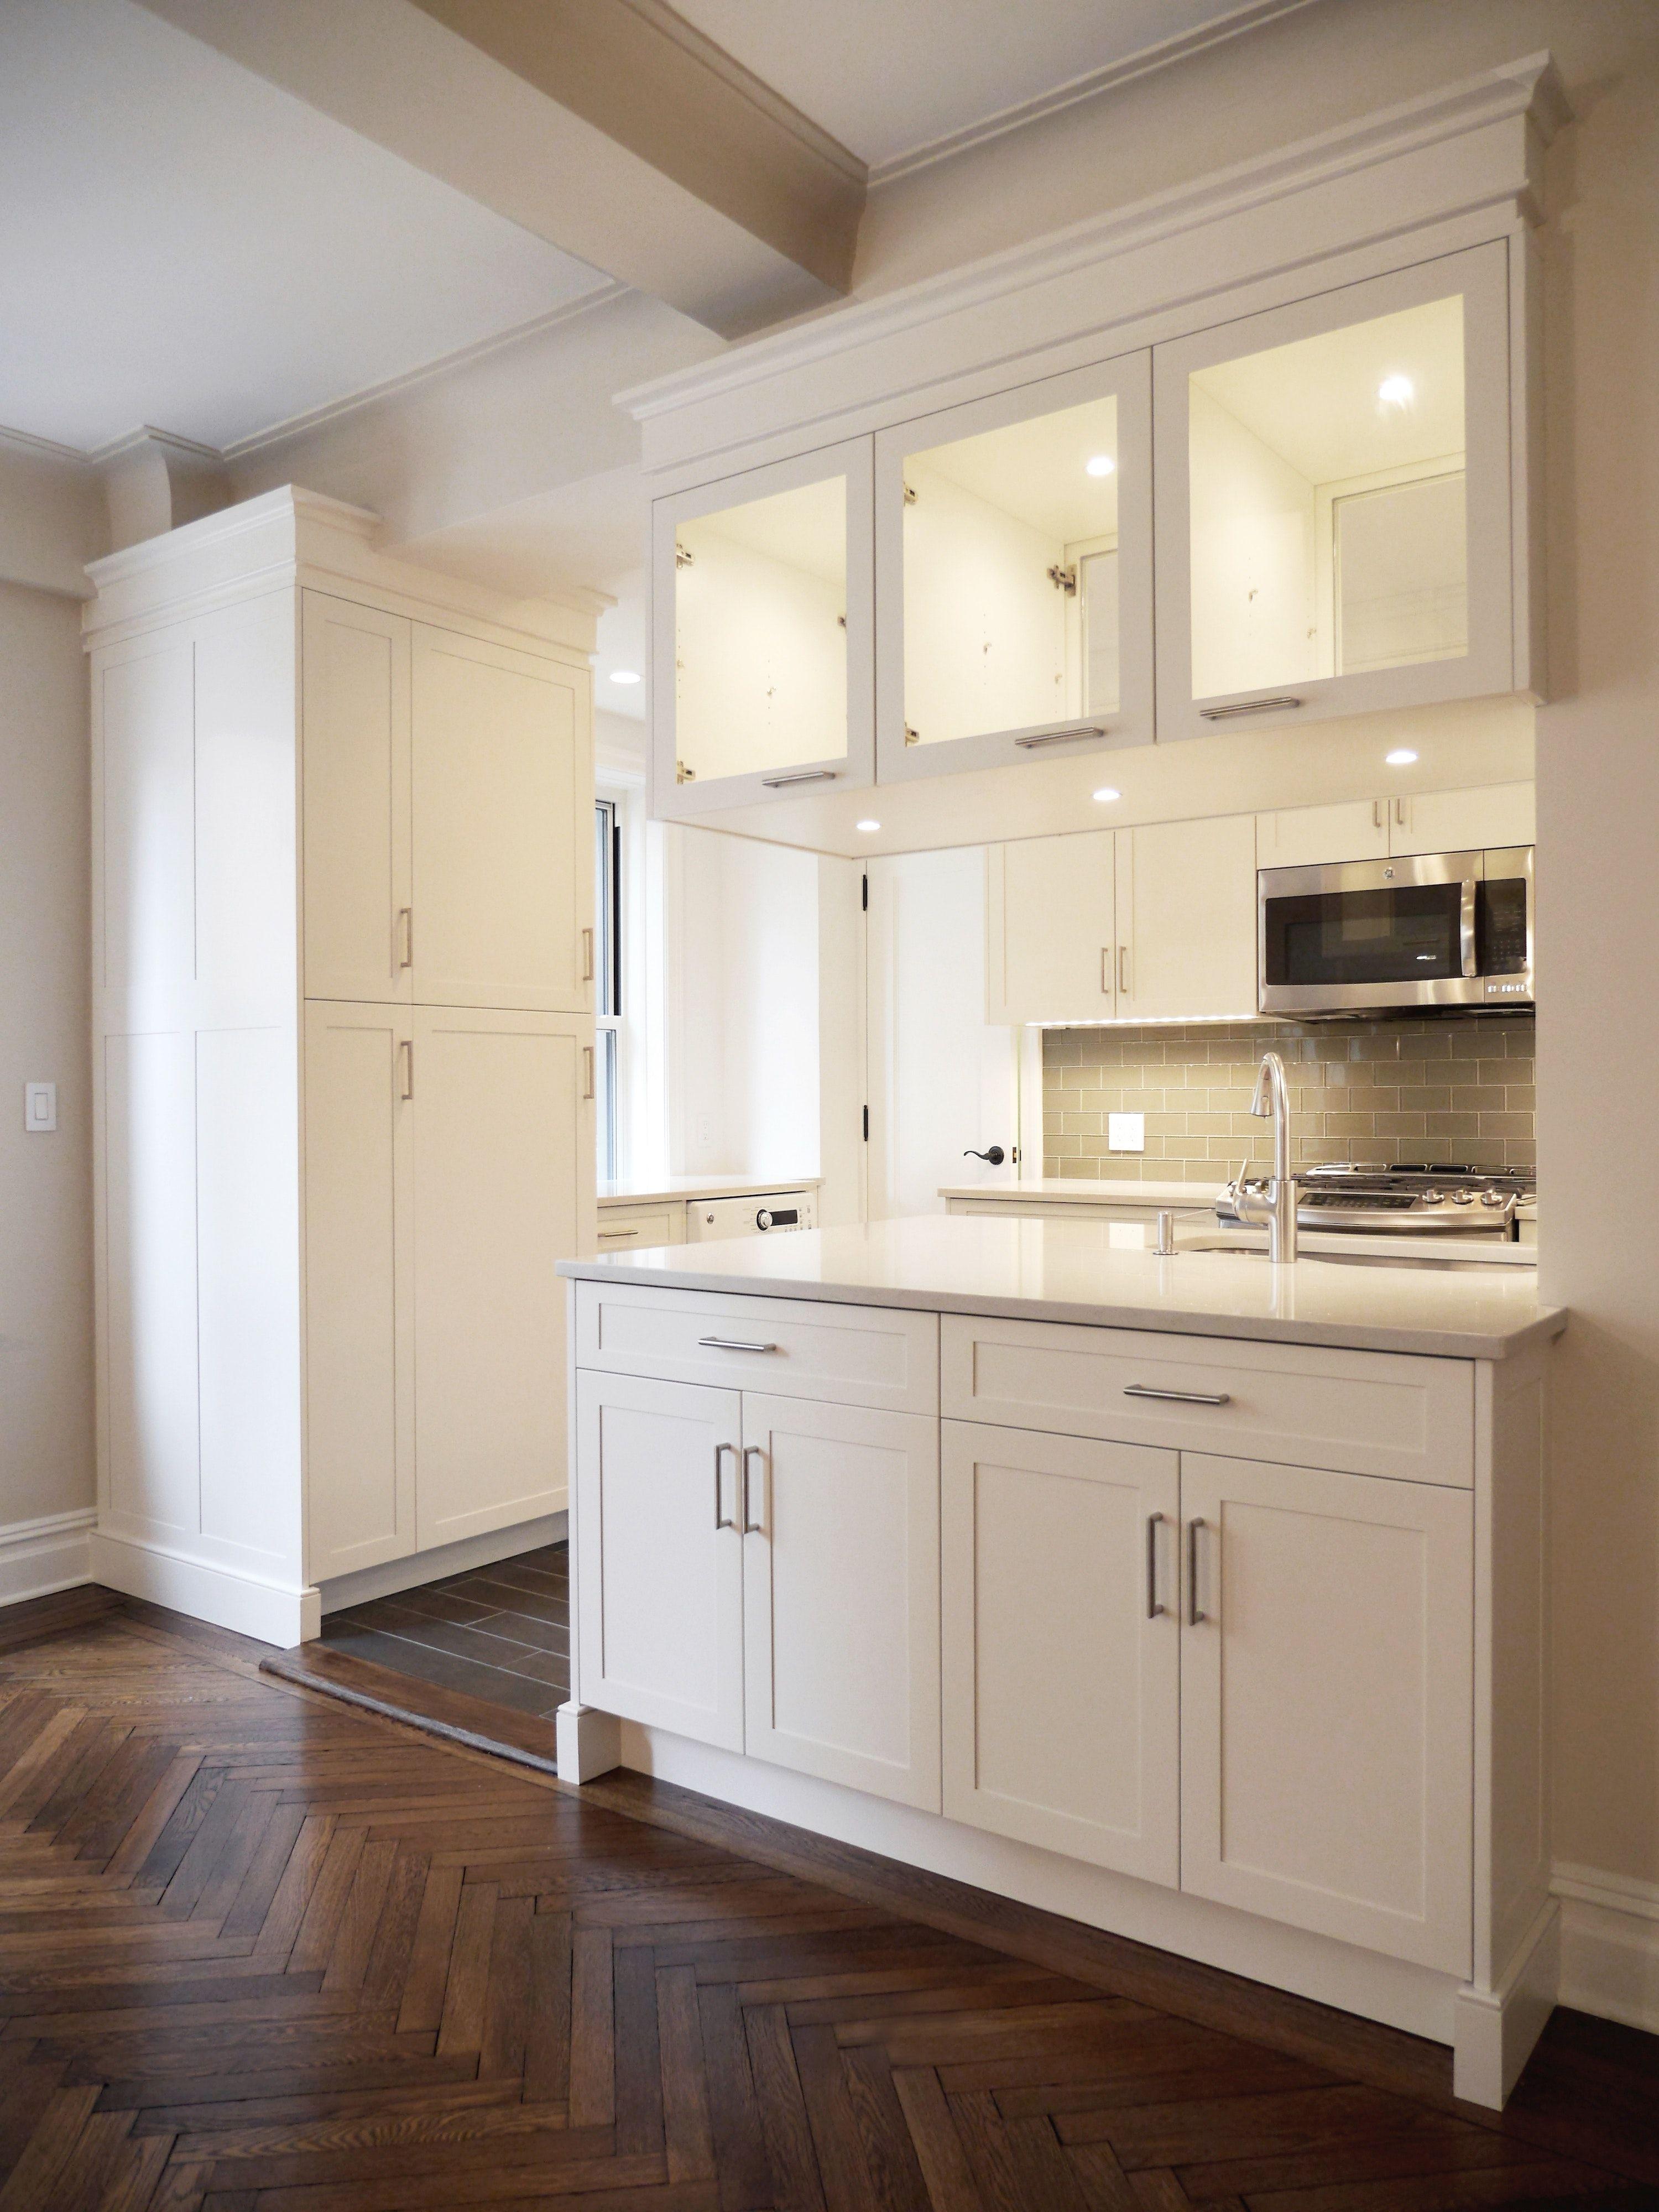 Interior Design Open Kitchen: Contemporary Open White Custom Kitchen/Cabinetry By Paula